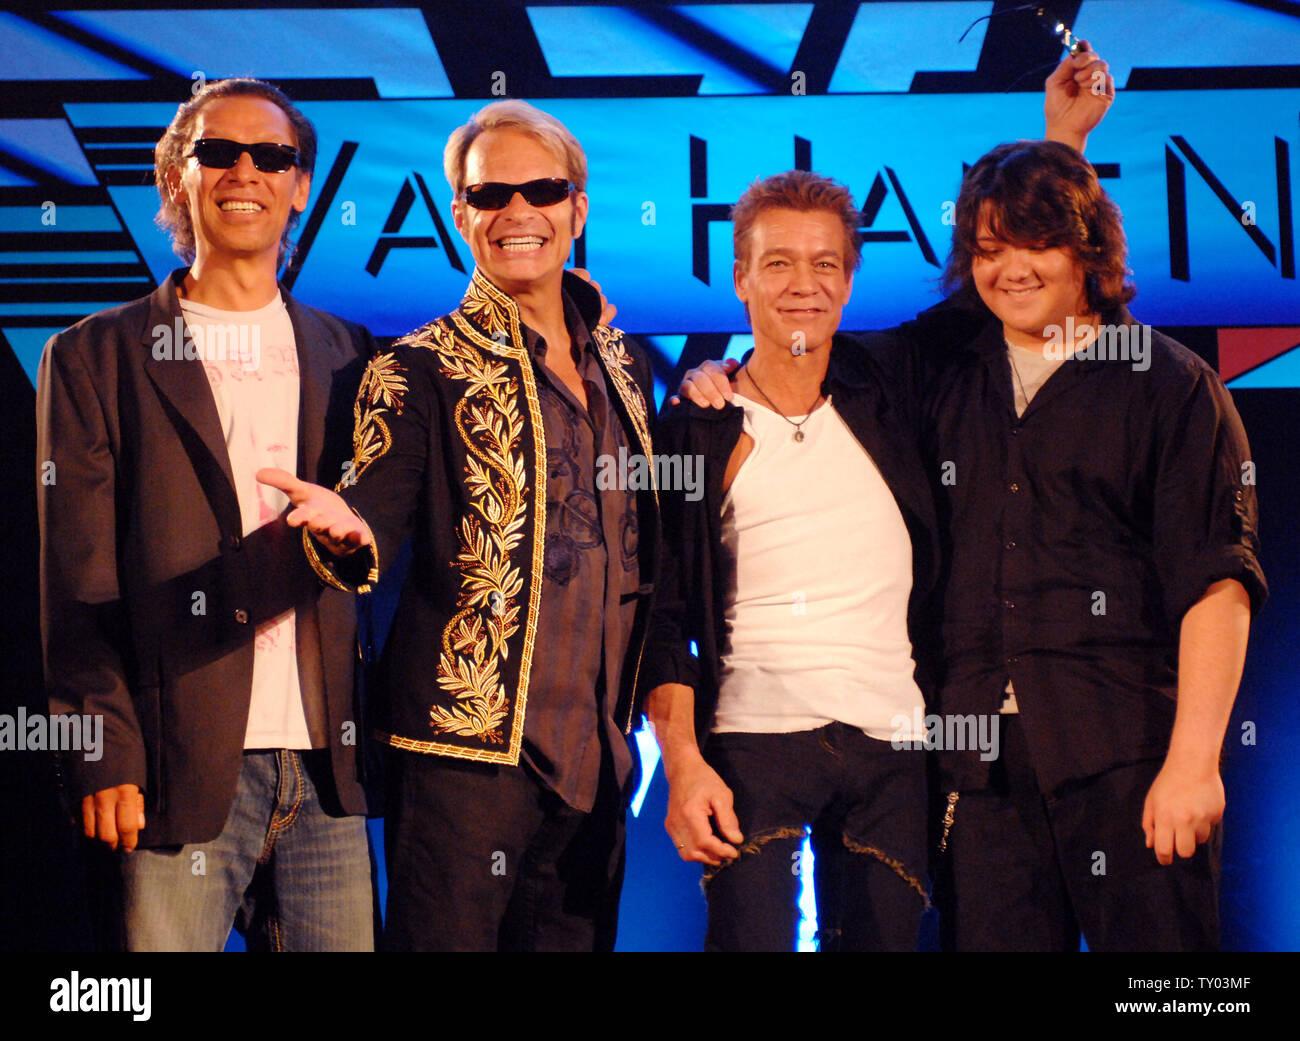 Members Of The Rock Group Van Halen Left To Right Alex Van Halen David Lee Roth Eddie Van Halen And Eddie S Son Wolfgang Van Halen Attend A News Conference To Officially Announce